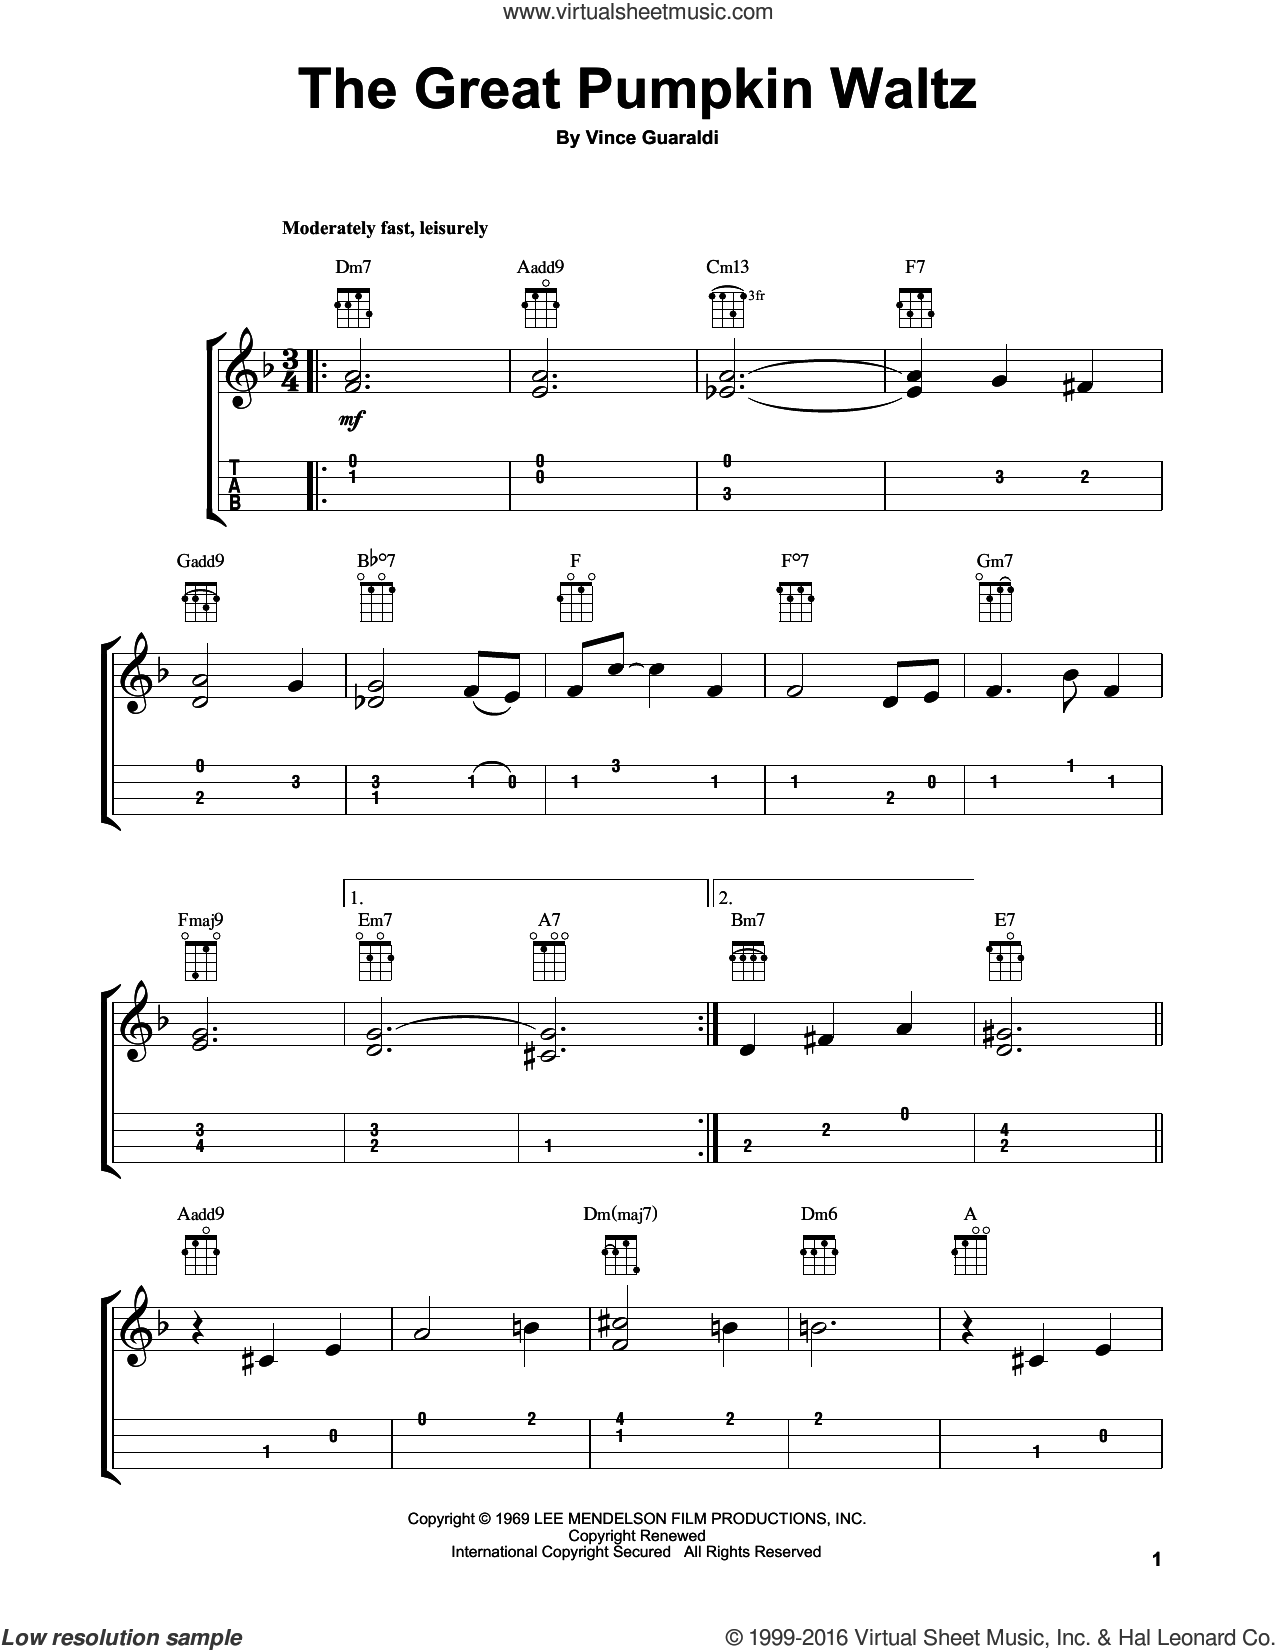 The Great Pumpkin Waltz sheet music for ukulele by Vince Guaraldi, intermediate skill level